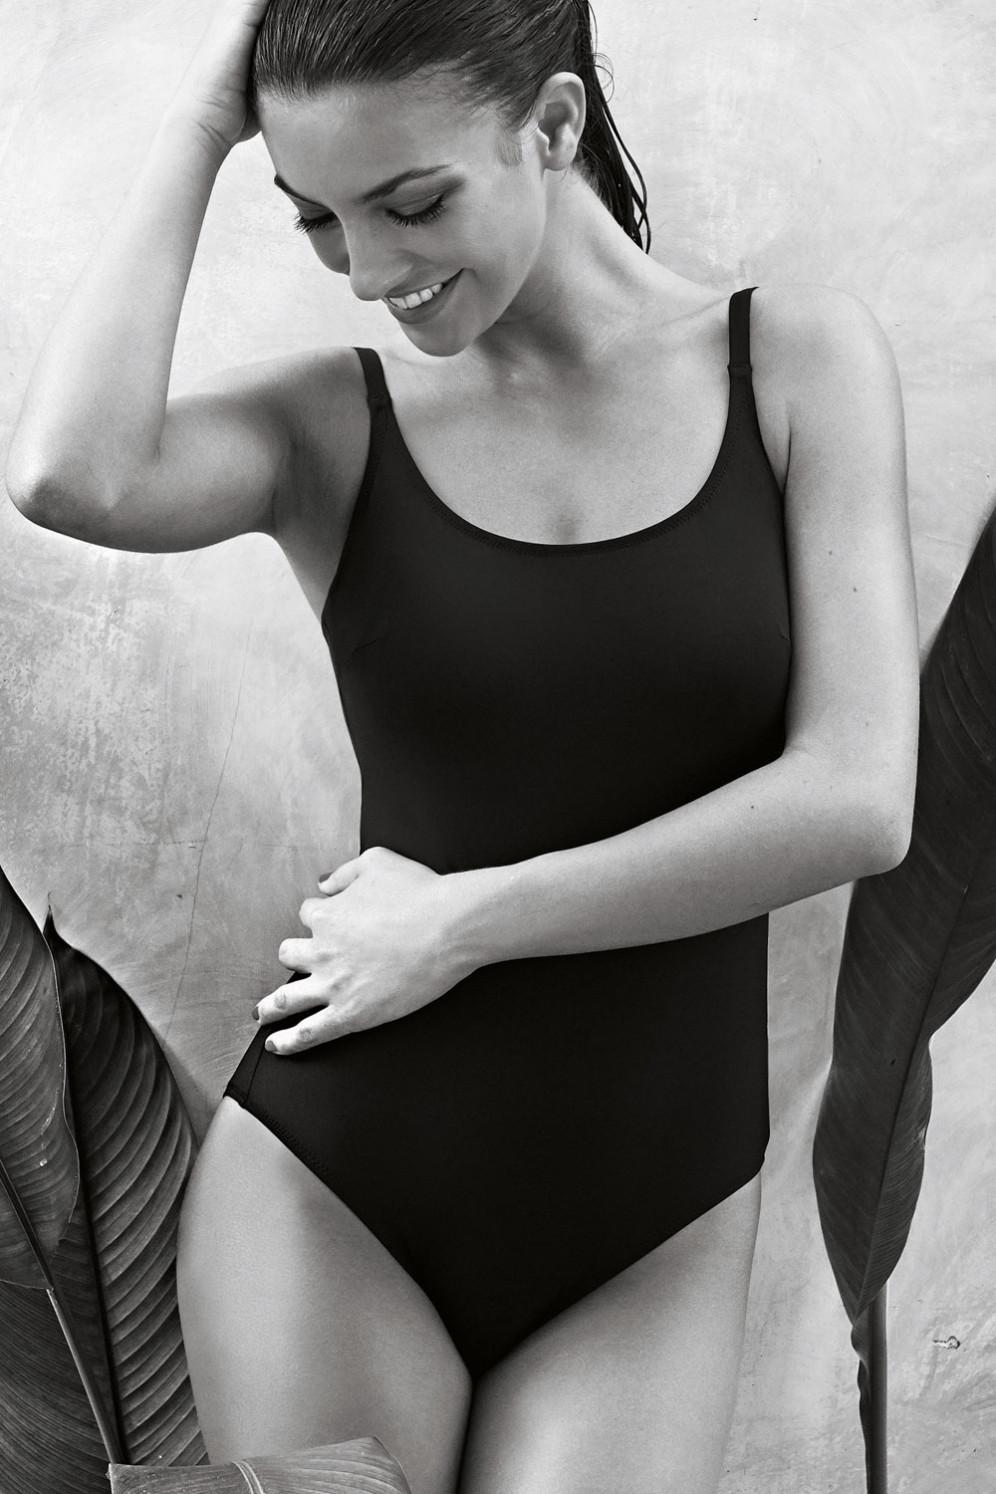 de4f2cd333dad5 Vergrößern Abbildung zu Badeanzug C-G perfect black suit (L8 7703) der  Marke Rosa Faia aus ...